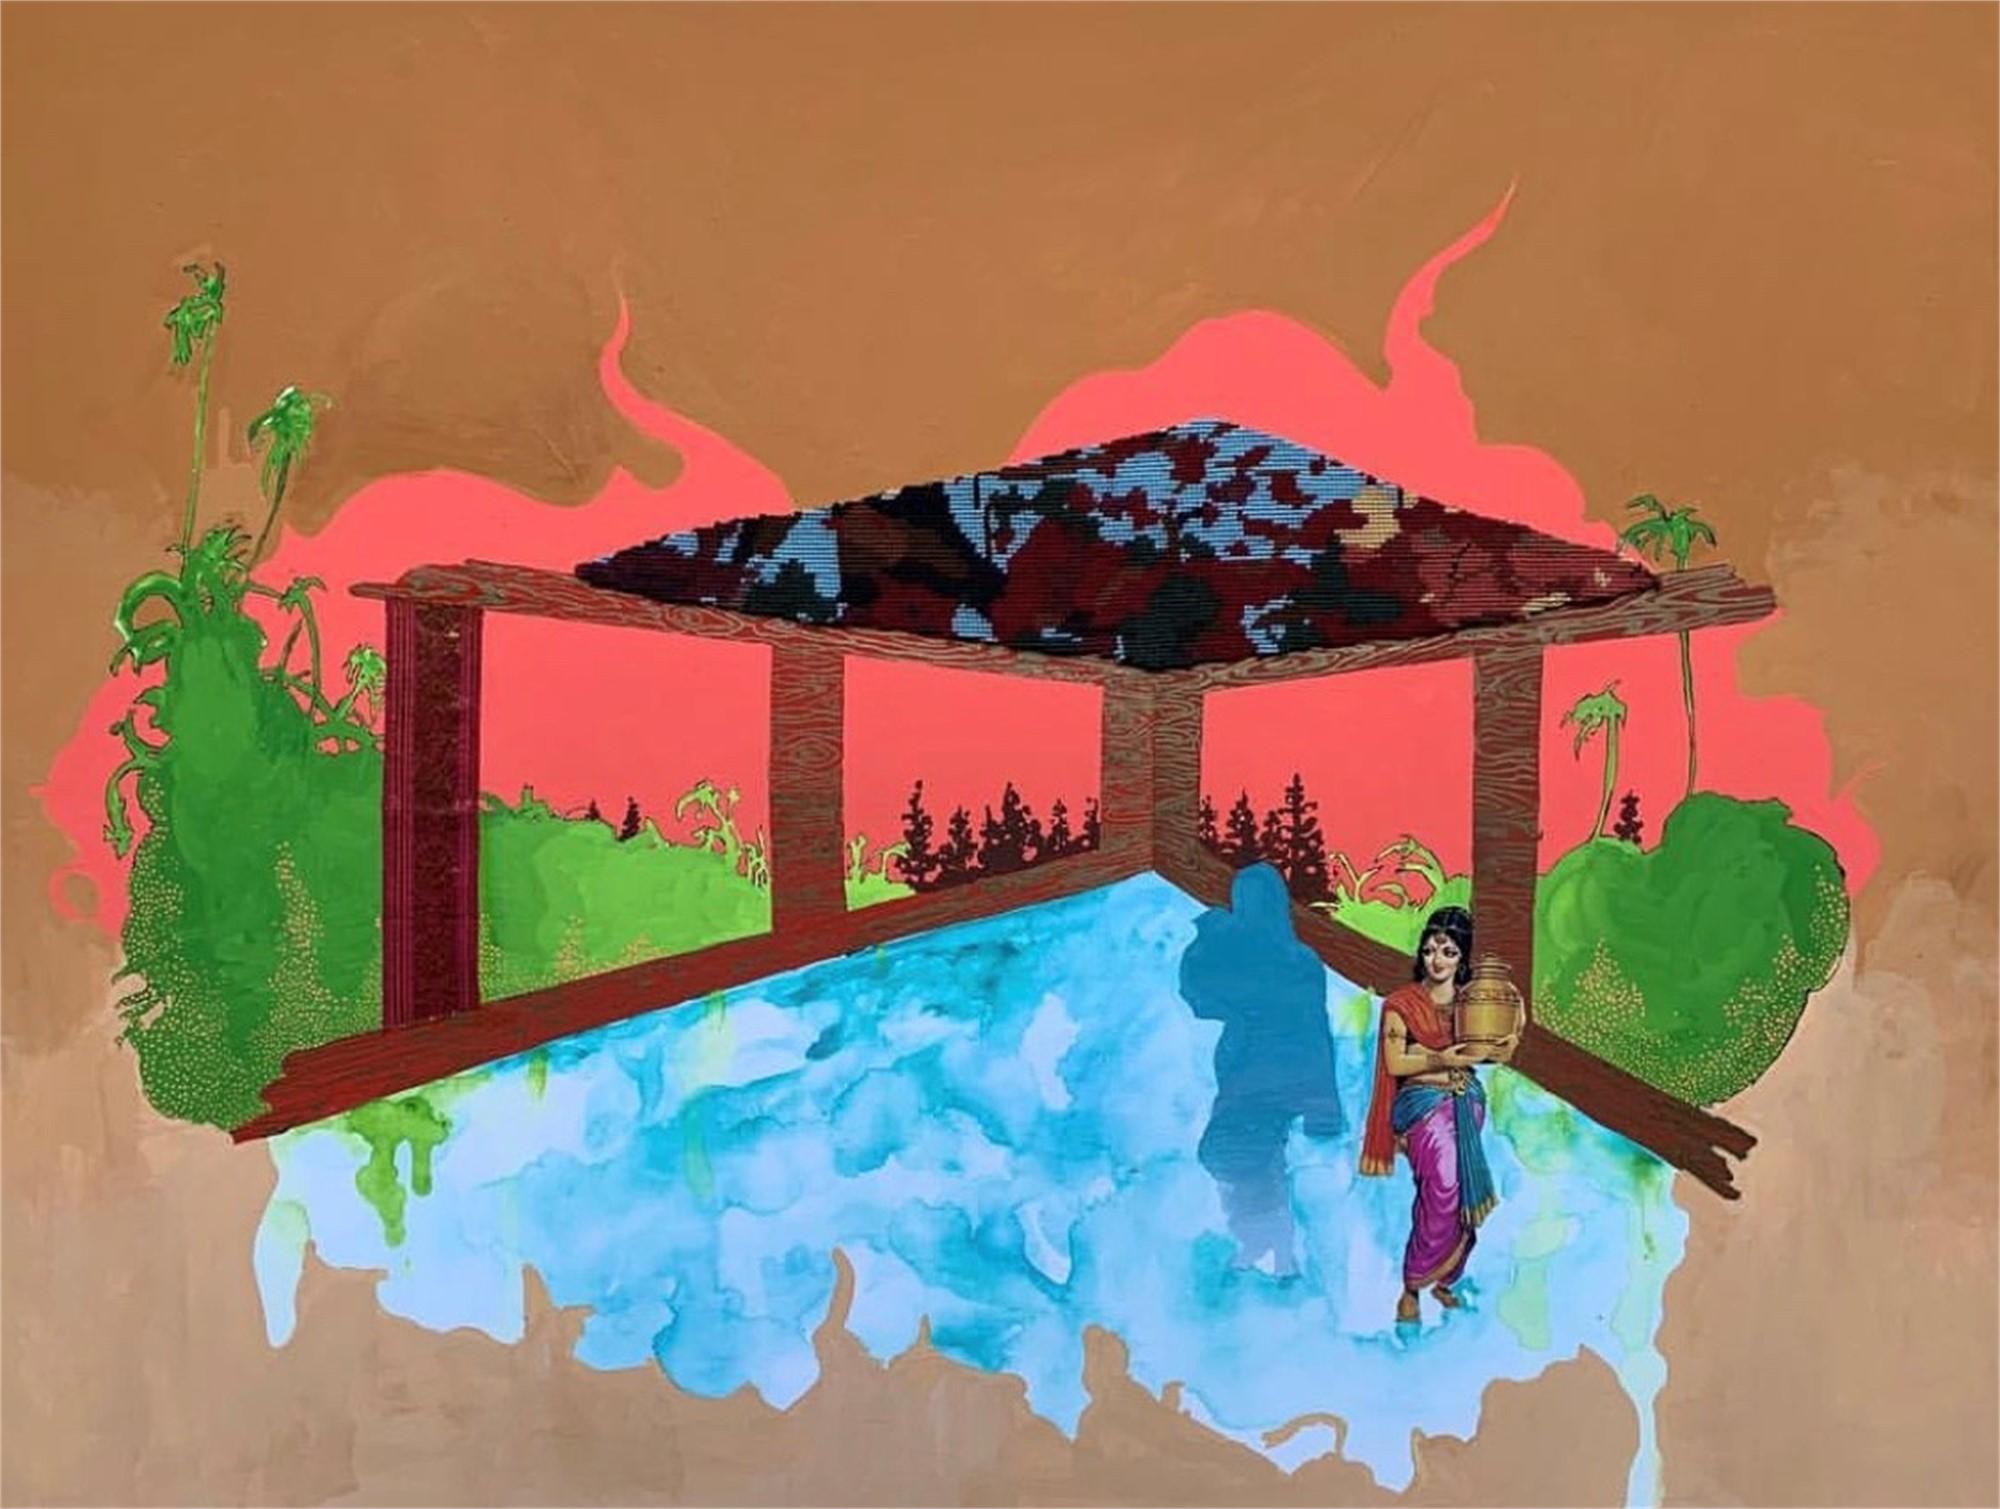 Shadow Land by Suchitra Mattai